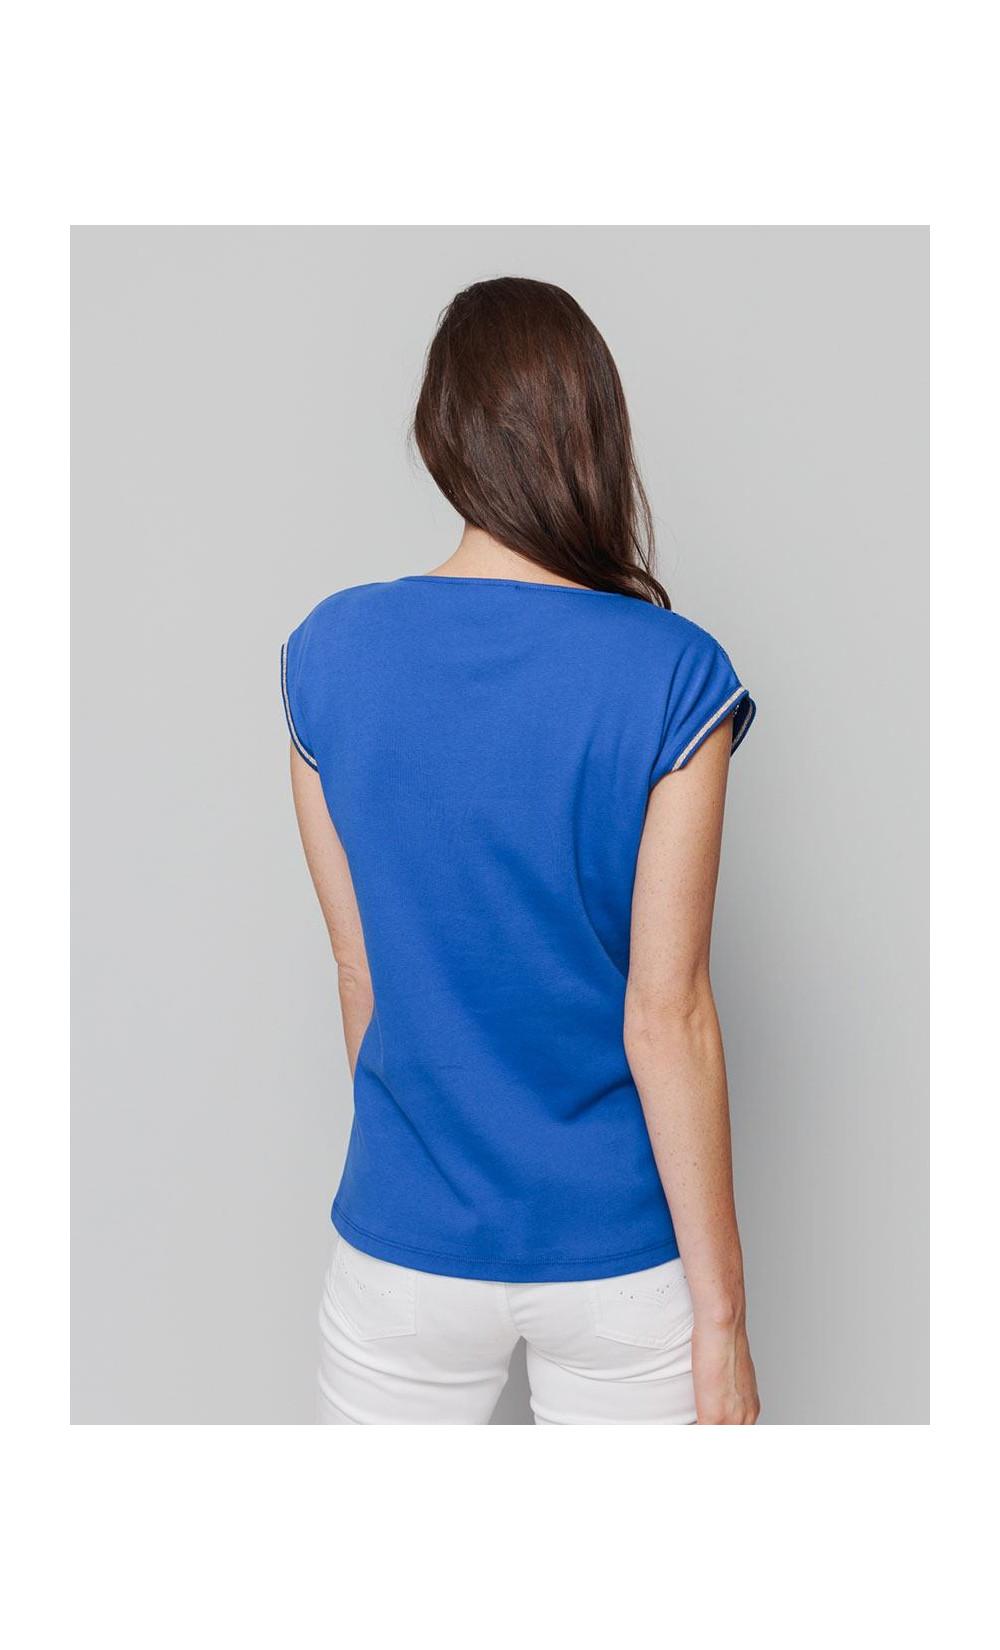 tee-shirt - CUBA